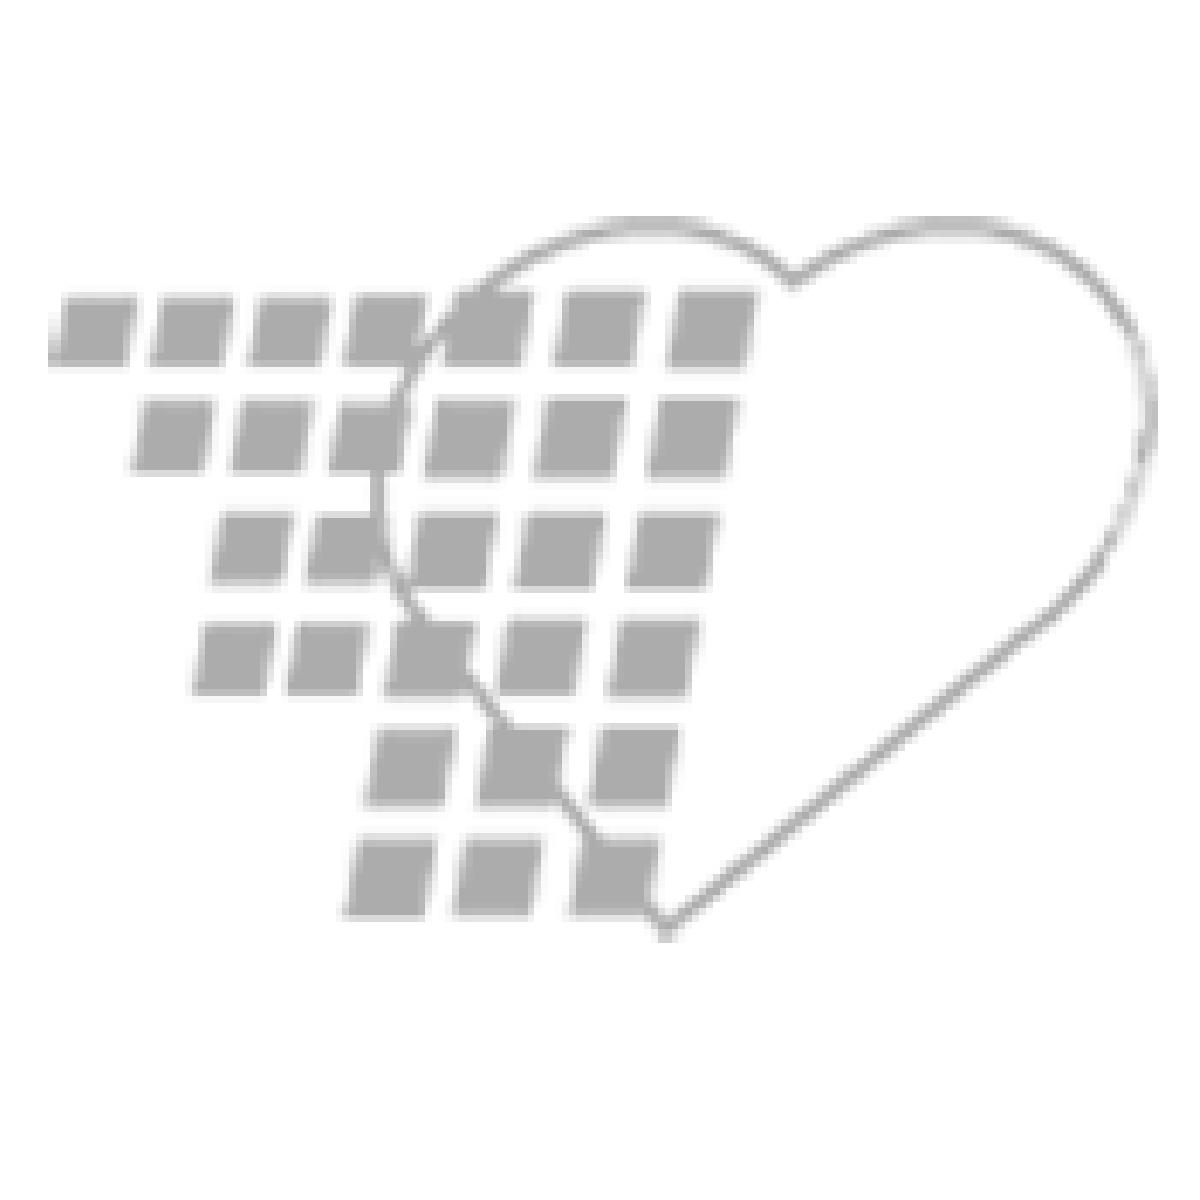 05-59-8300-1OZ - Bulb Syringe Sterile - 1oz